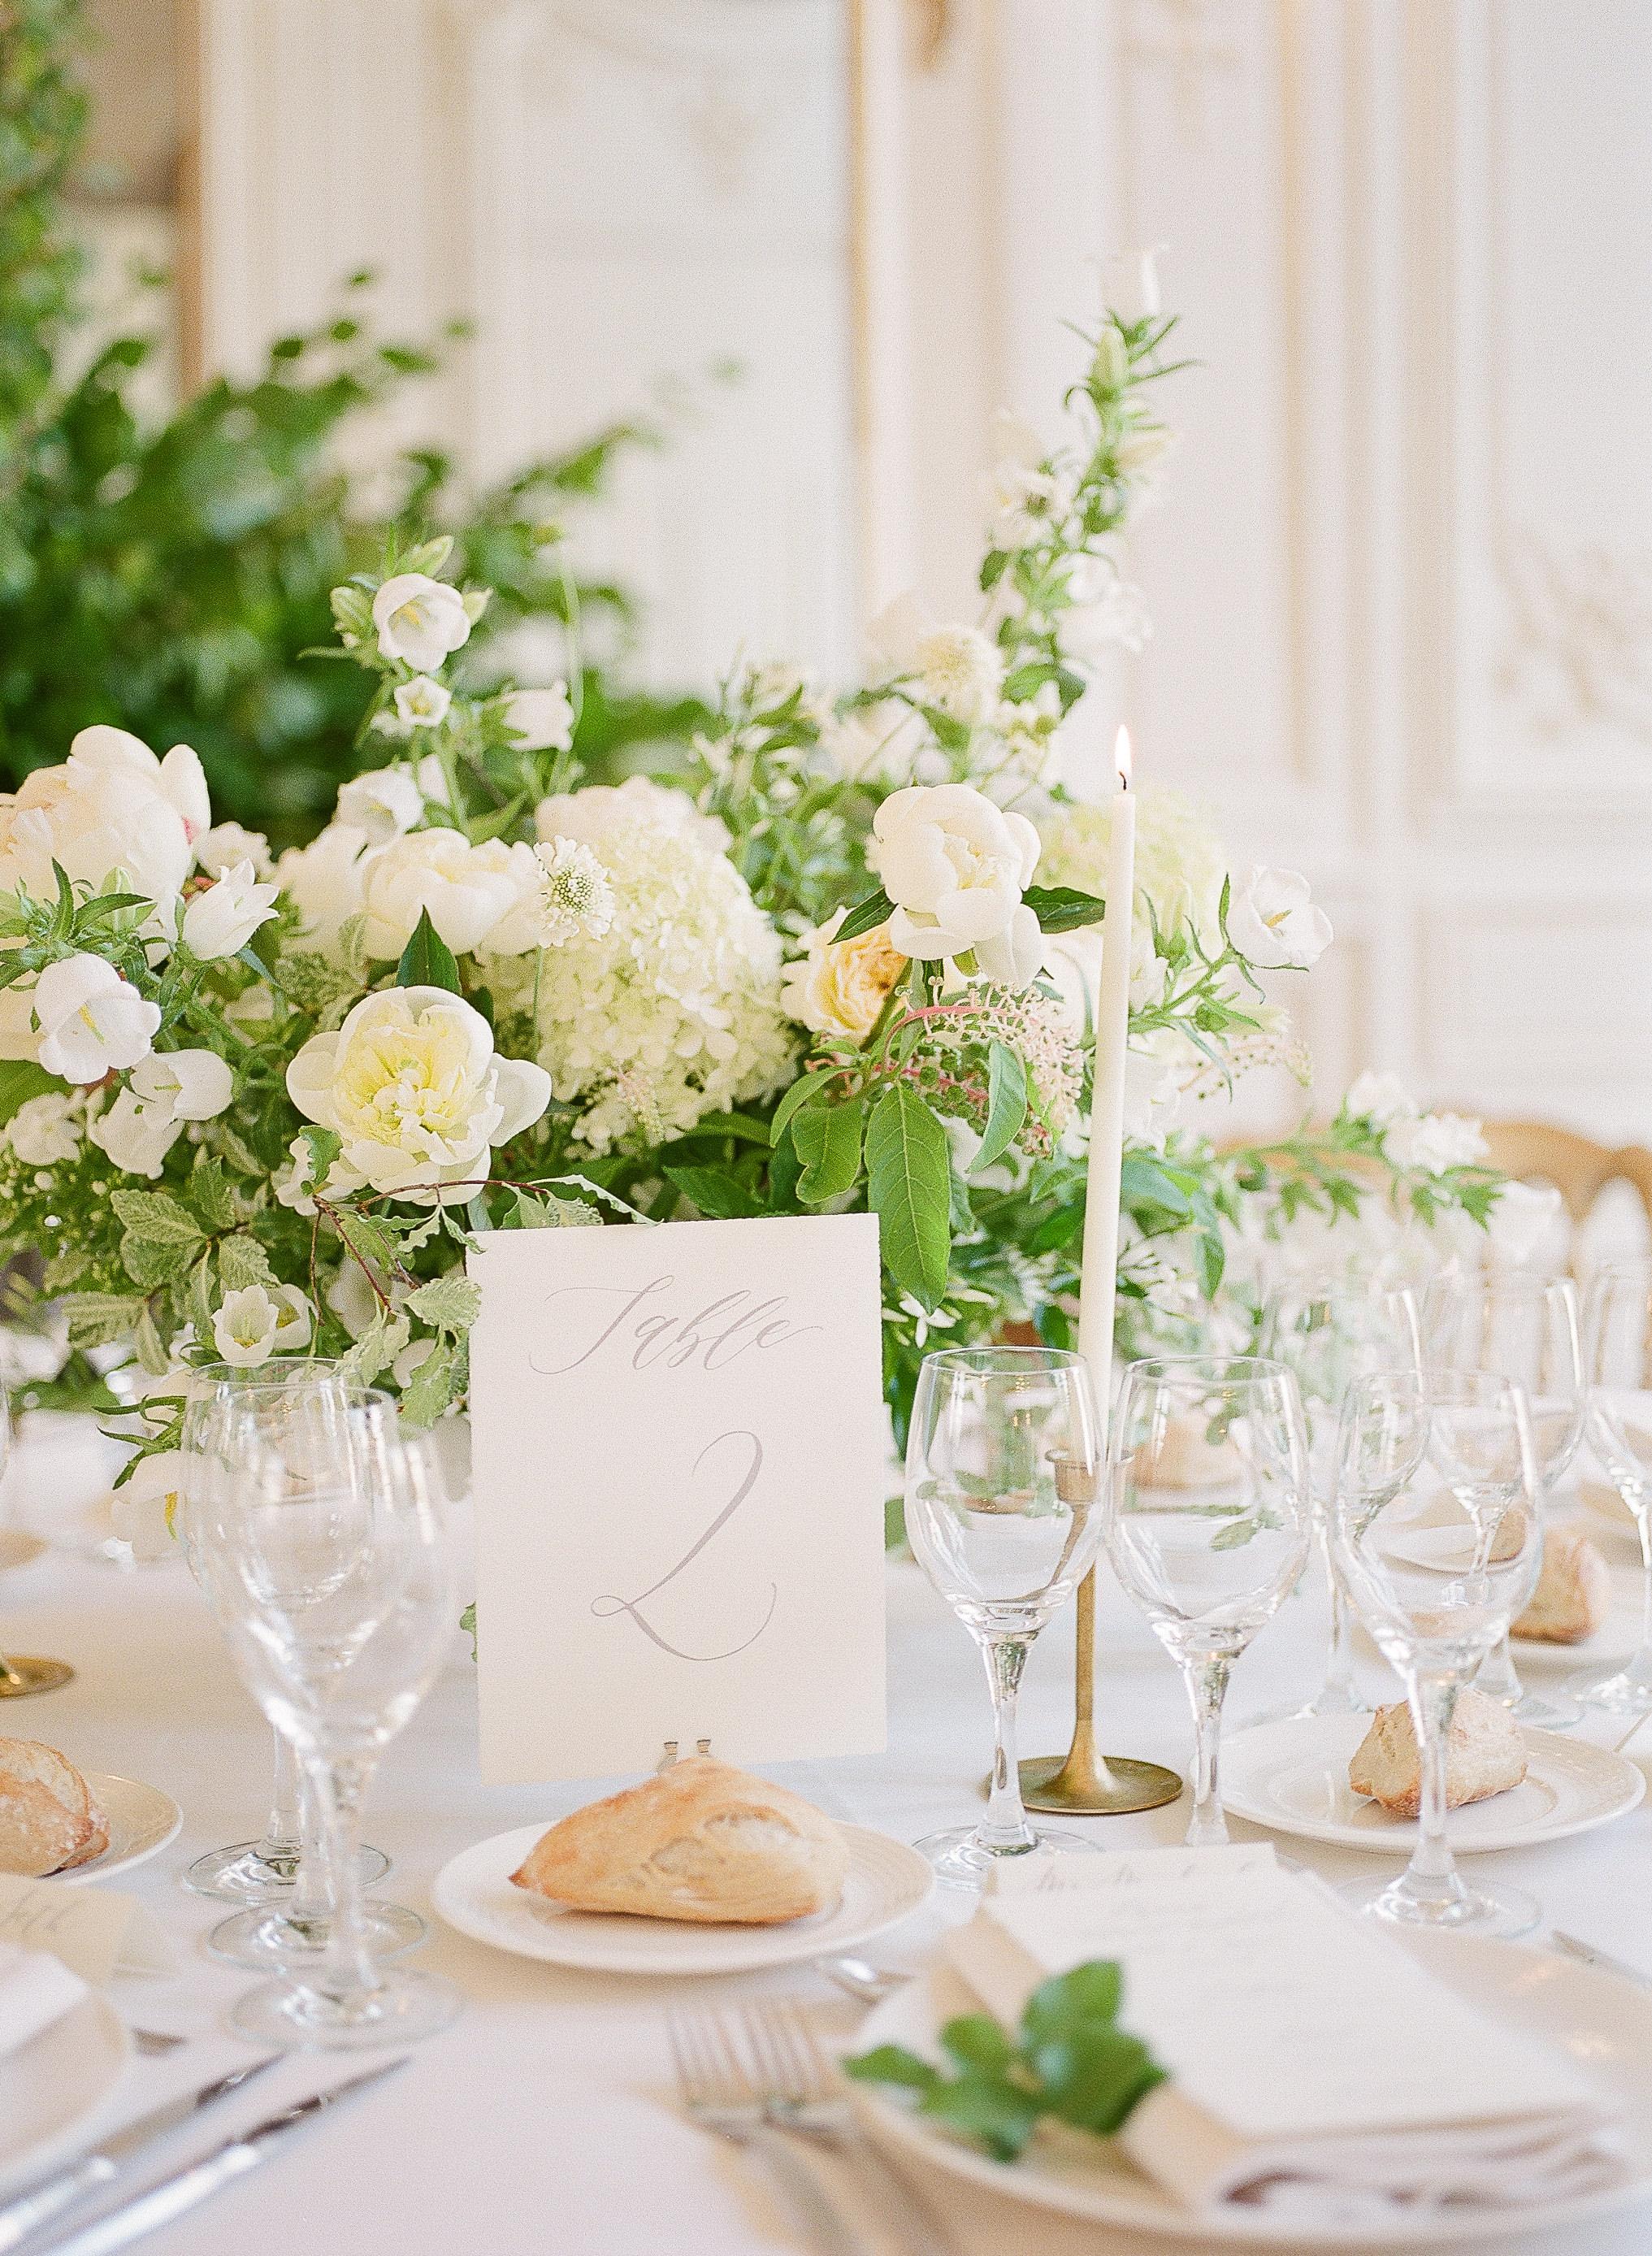 paris-wedding-florist-white-and-green-wedding-flowers-france-florist.jpg